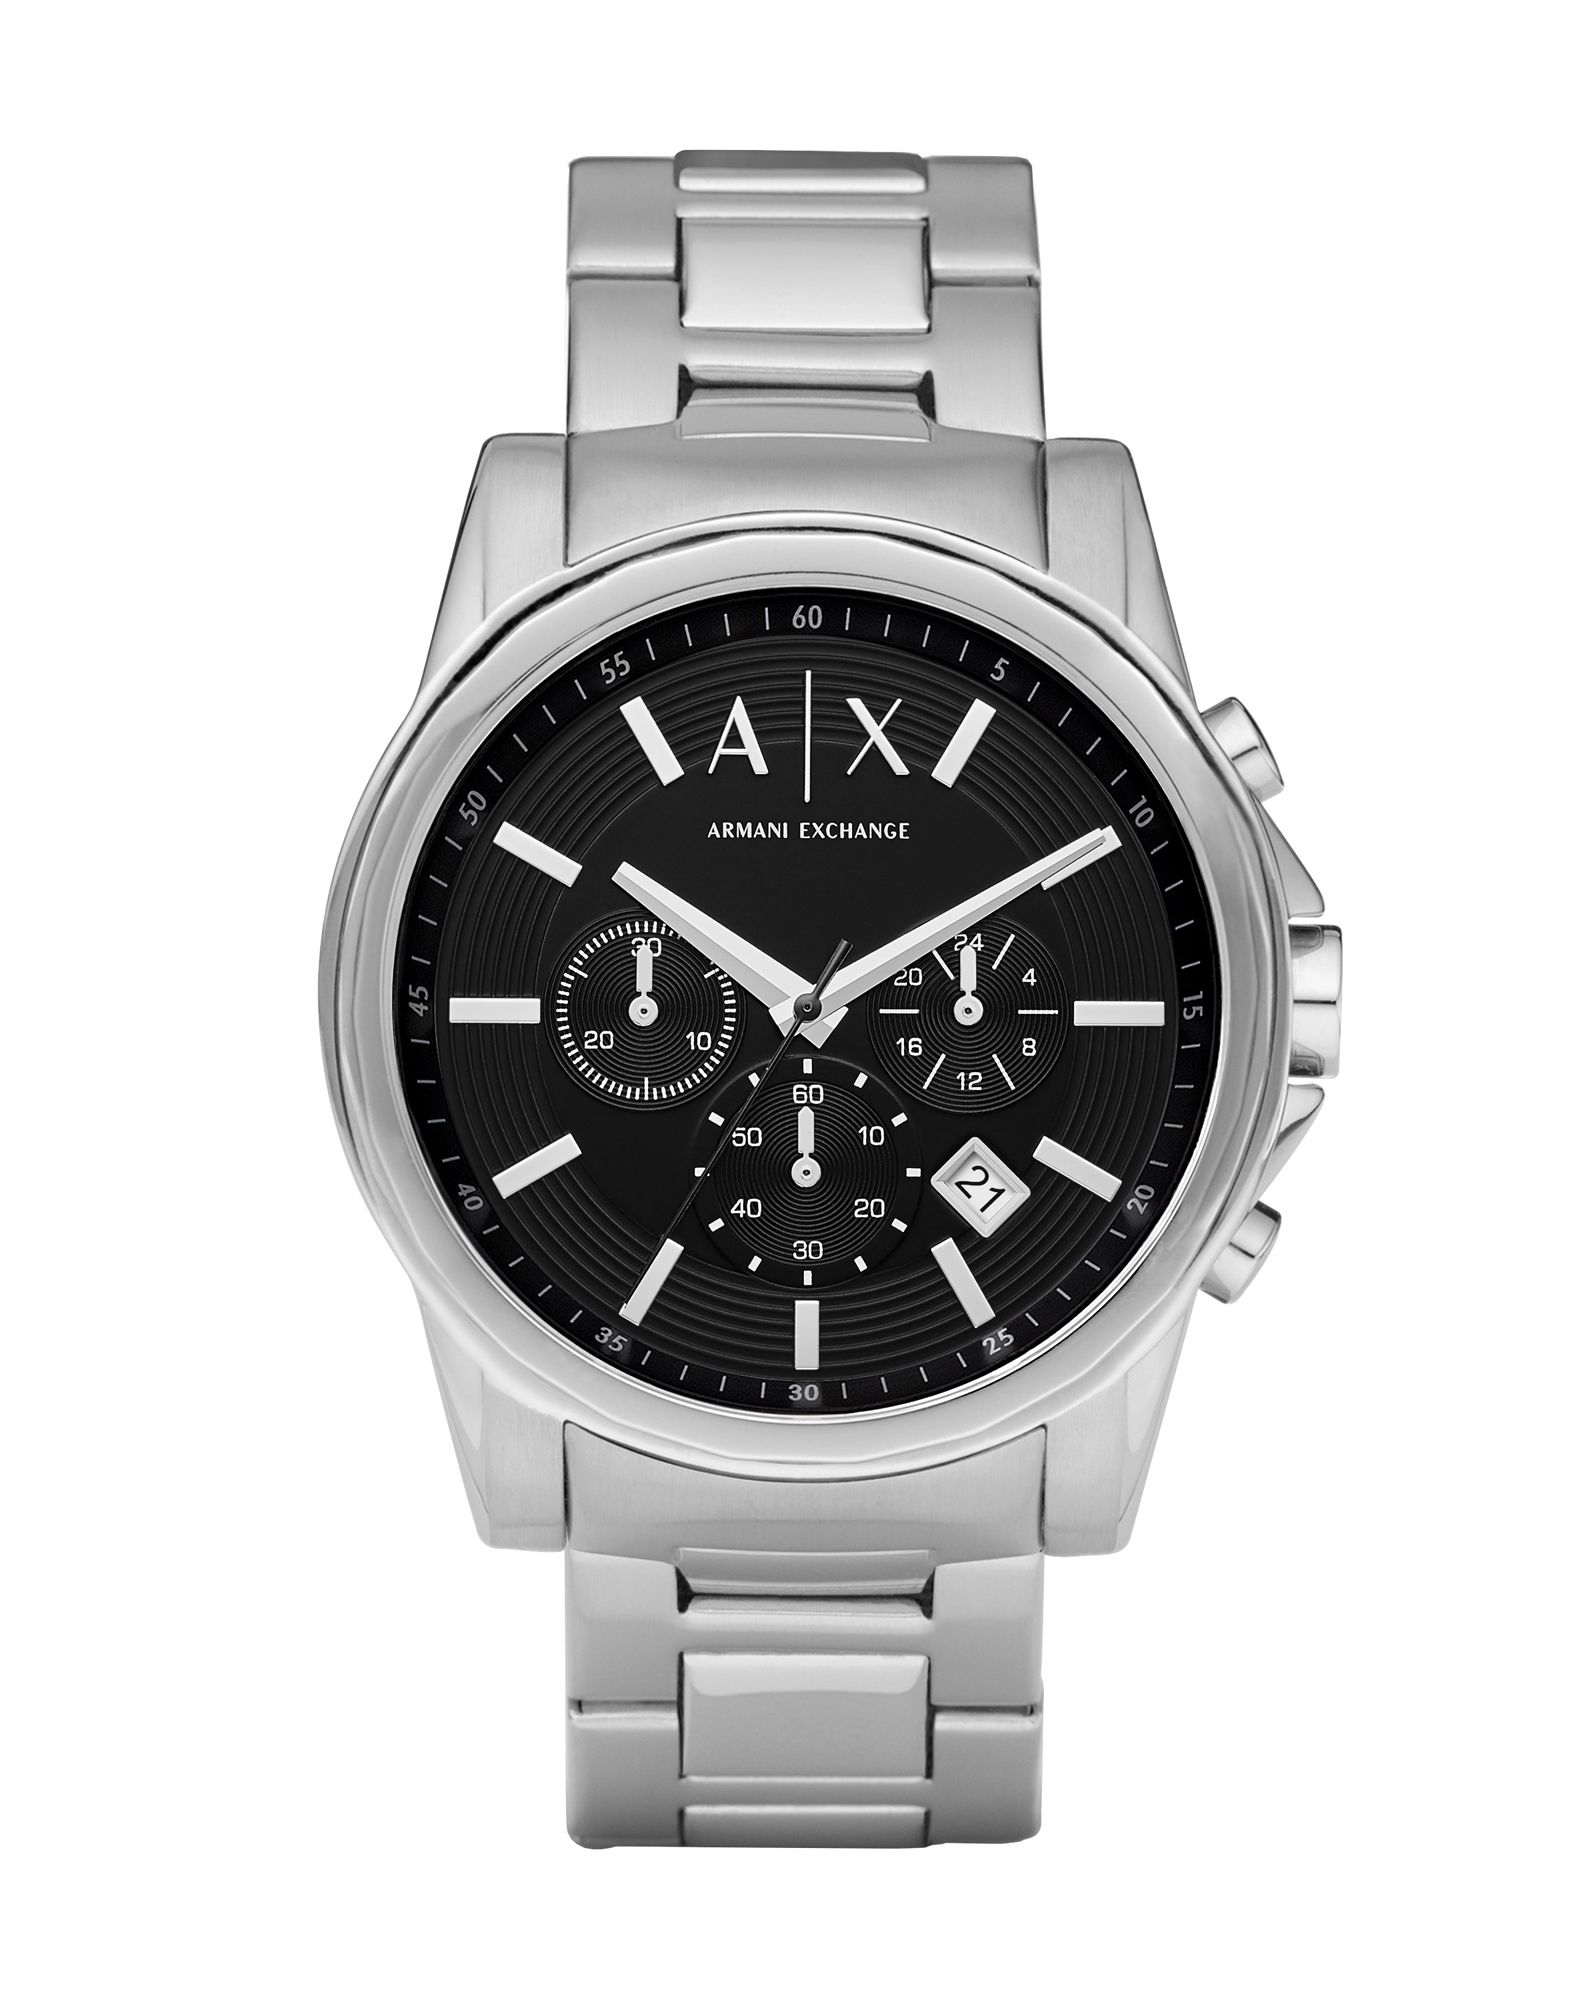 ARMANI EXCHANGE メンズ 腕時計 シルバー ステンレススチール